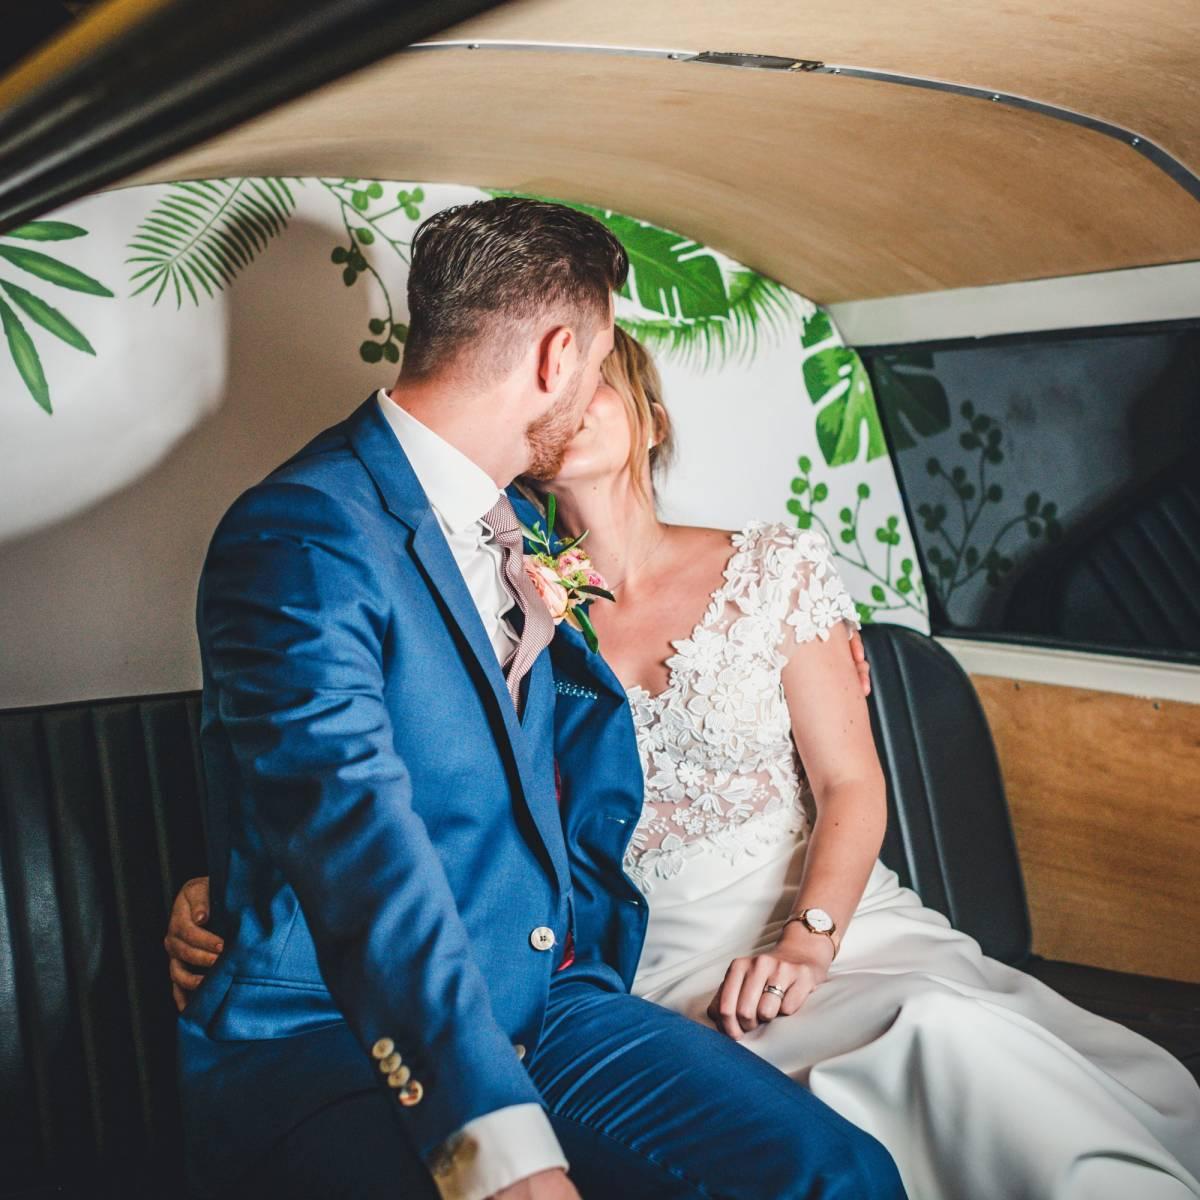 Bulli - Photobooth - House of Weddings (19)